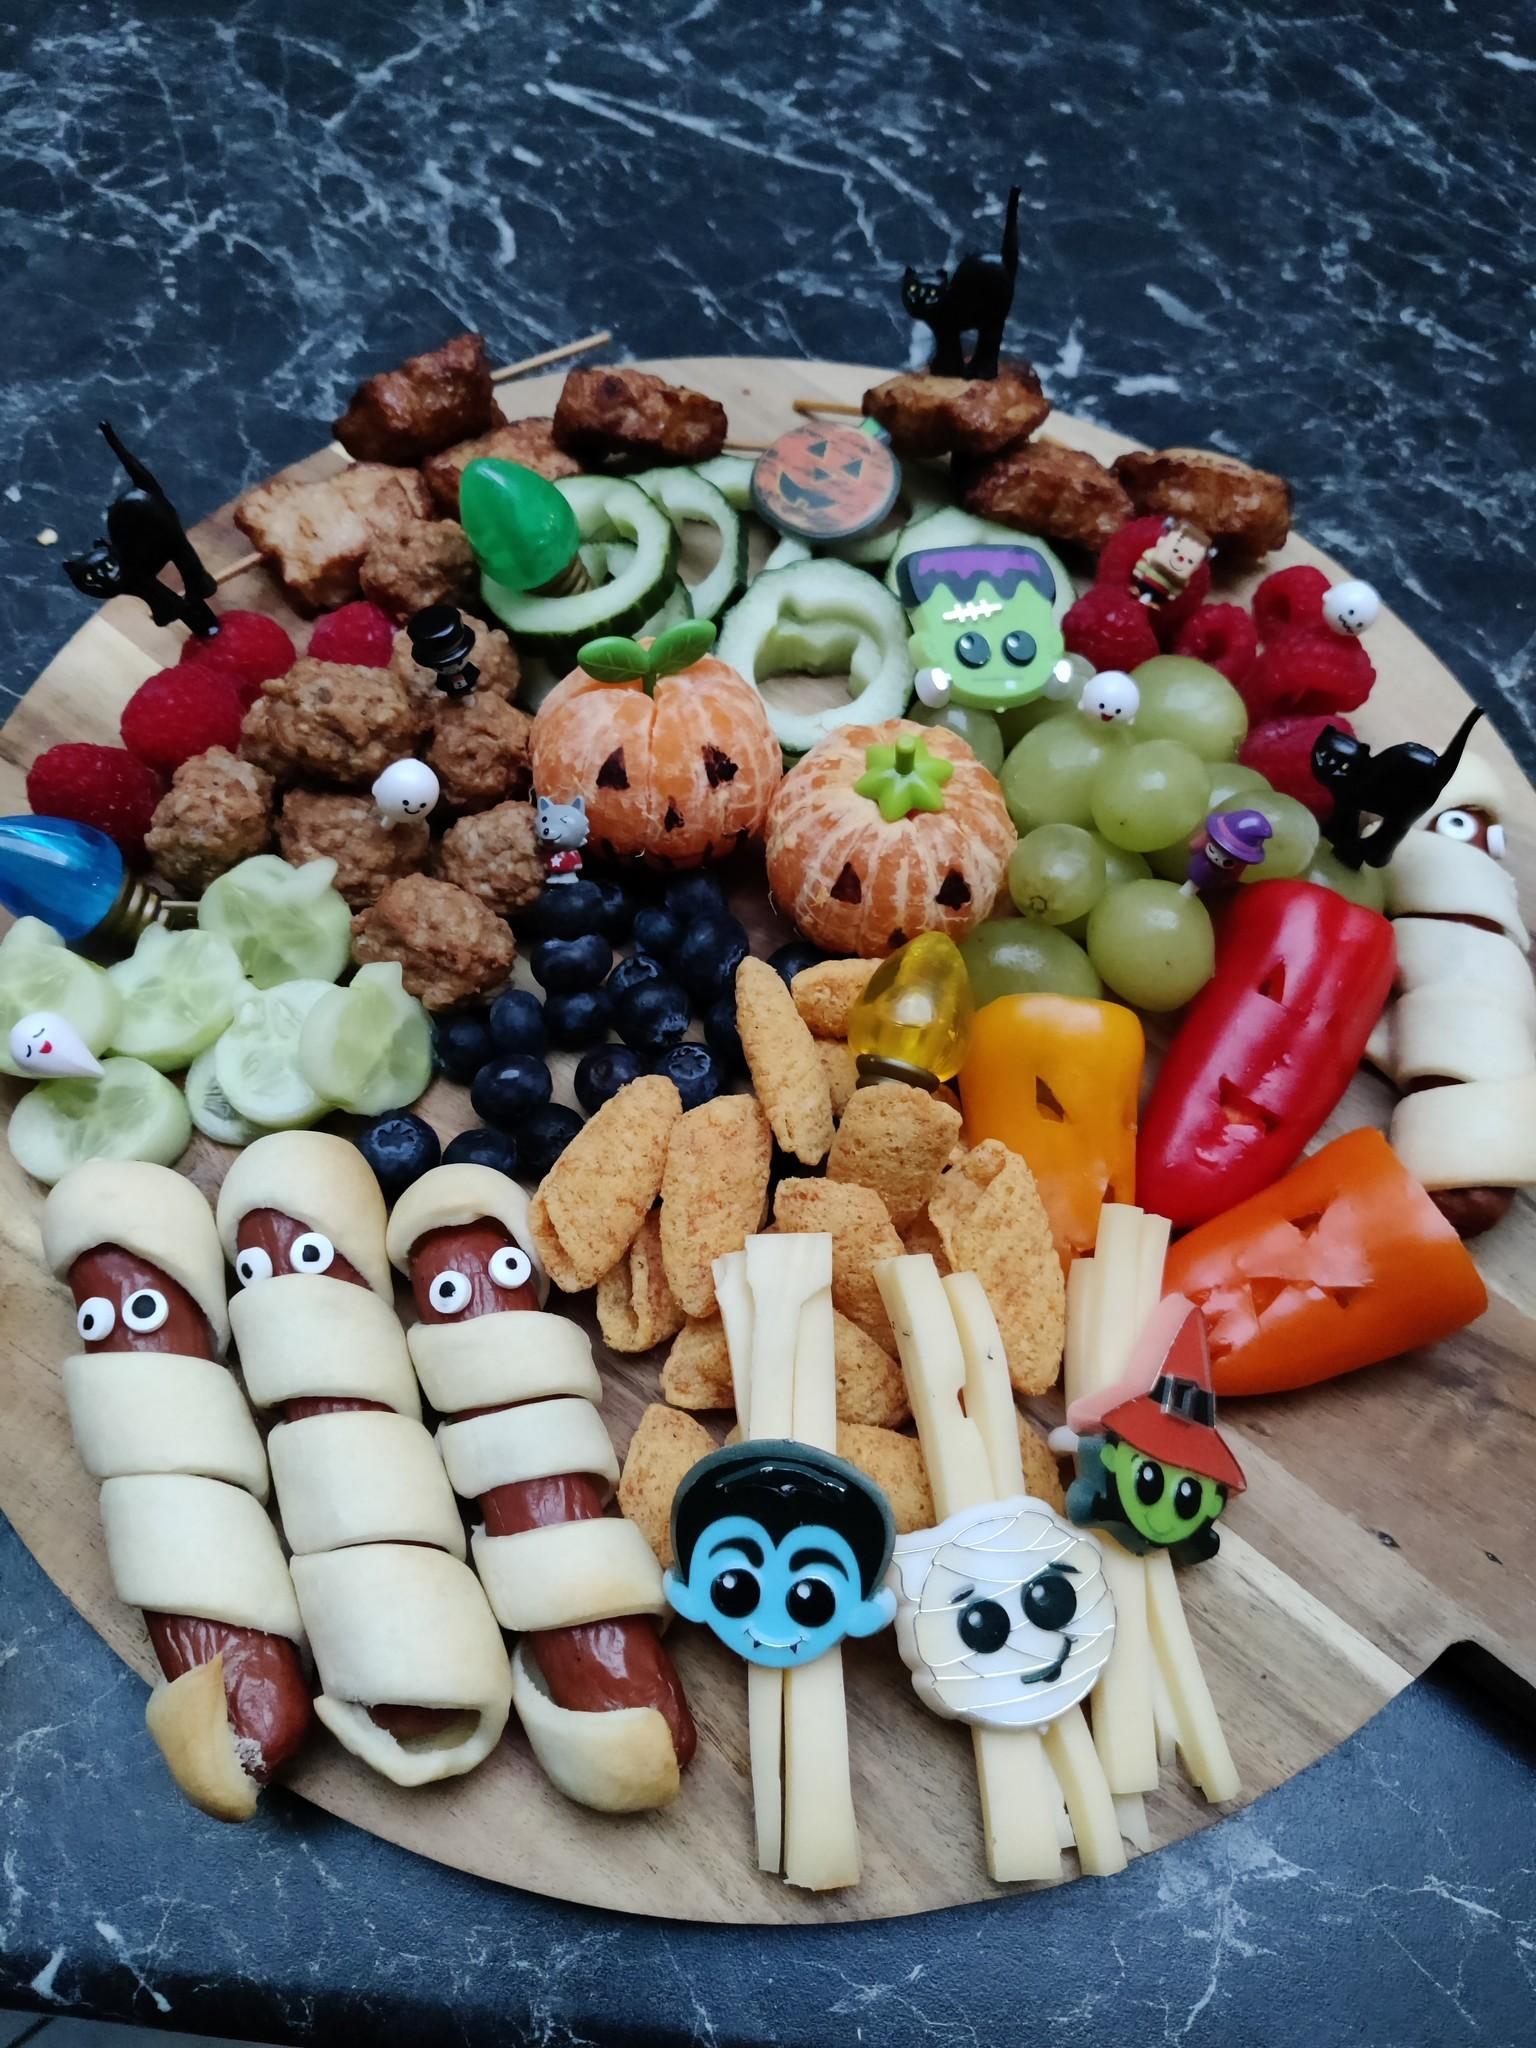 Monkey platters met Sanne van Two Little Vikings. Leer je kind gevarieerd eten op een leuke manier.